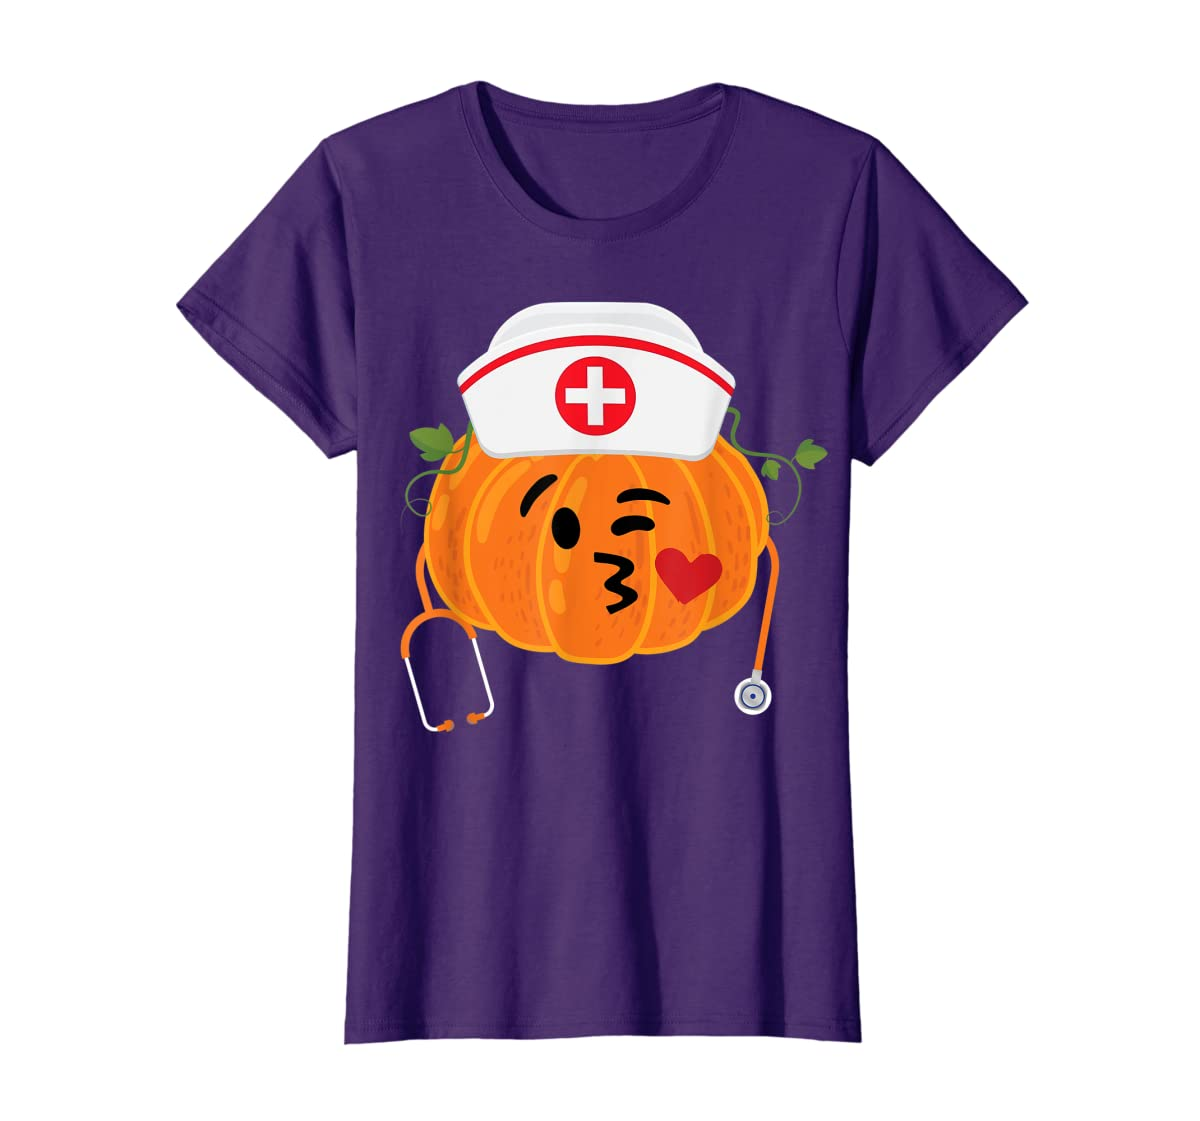 Nurse Stethoscope Pumpkin Funny Nursing Halloween Gift T-Shirt-Women's T-Shirt-Purple